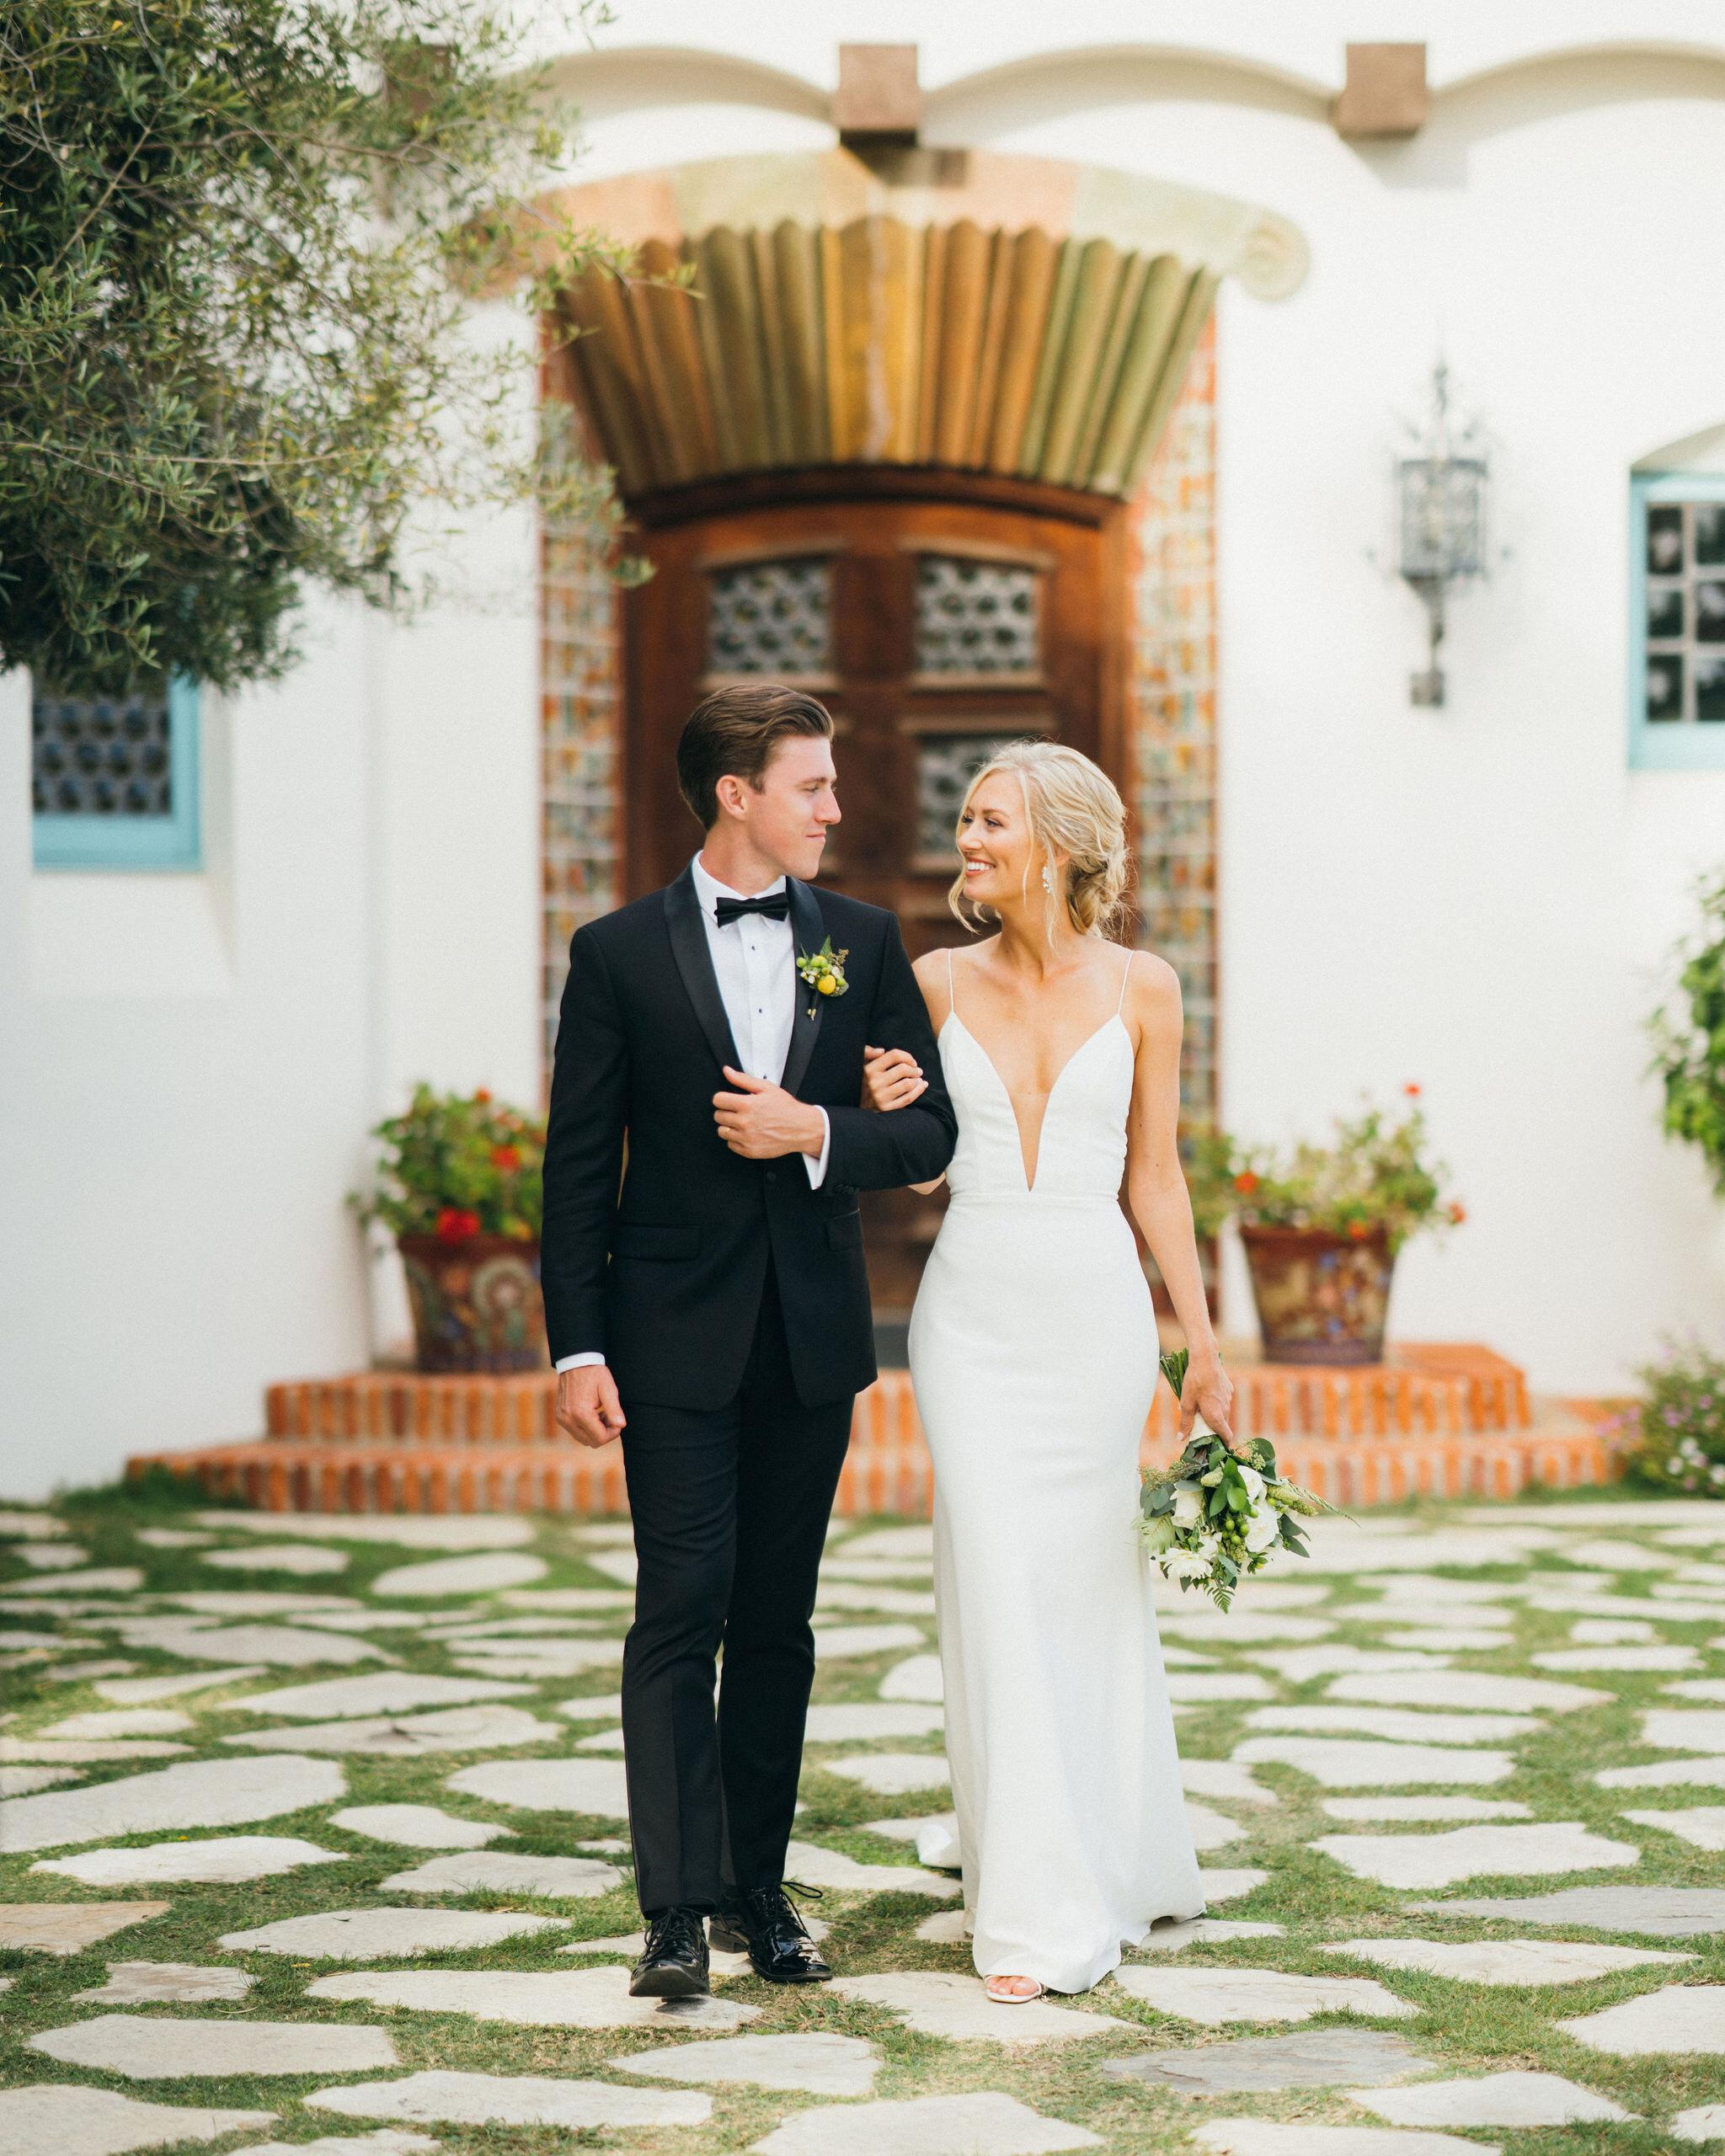 adamson-house-wedding-photography-140.jpg